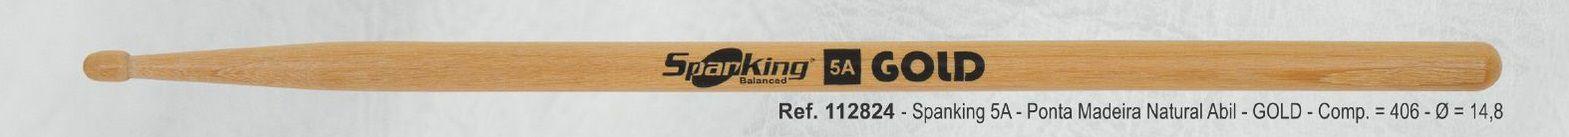 Baqueta Spanking Gold 5A Abiurana